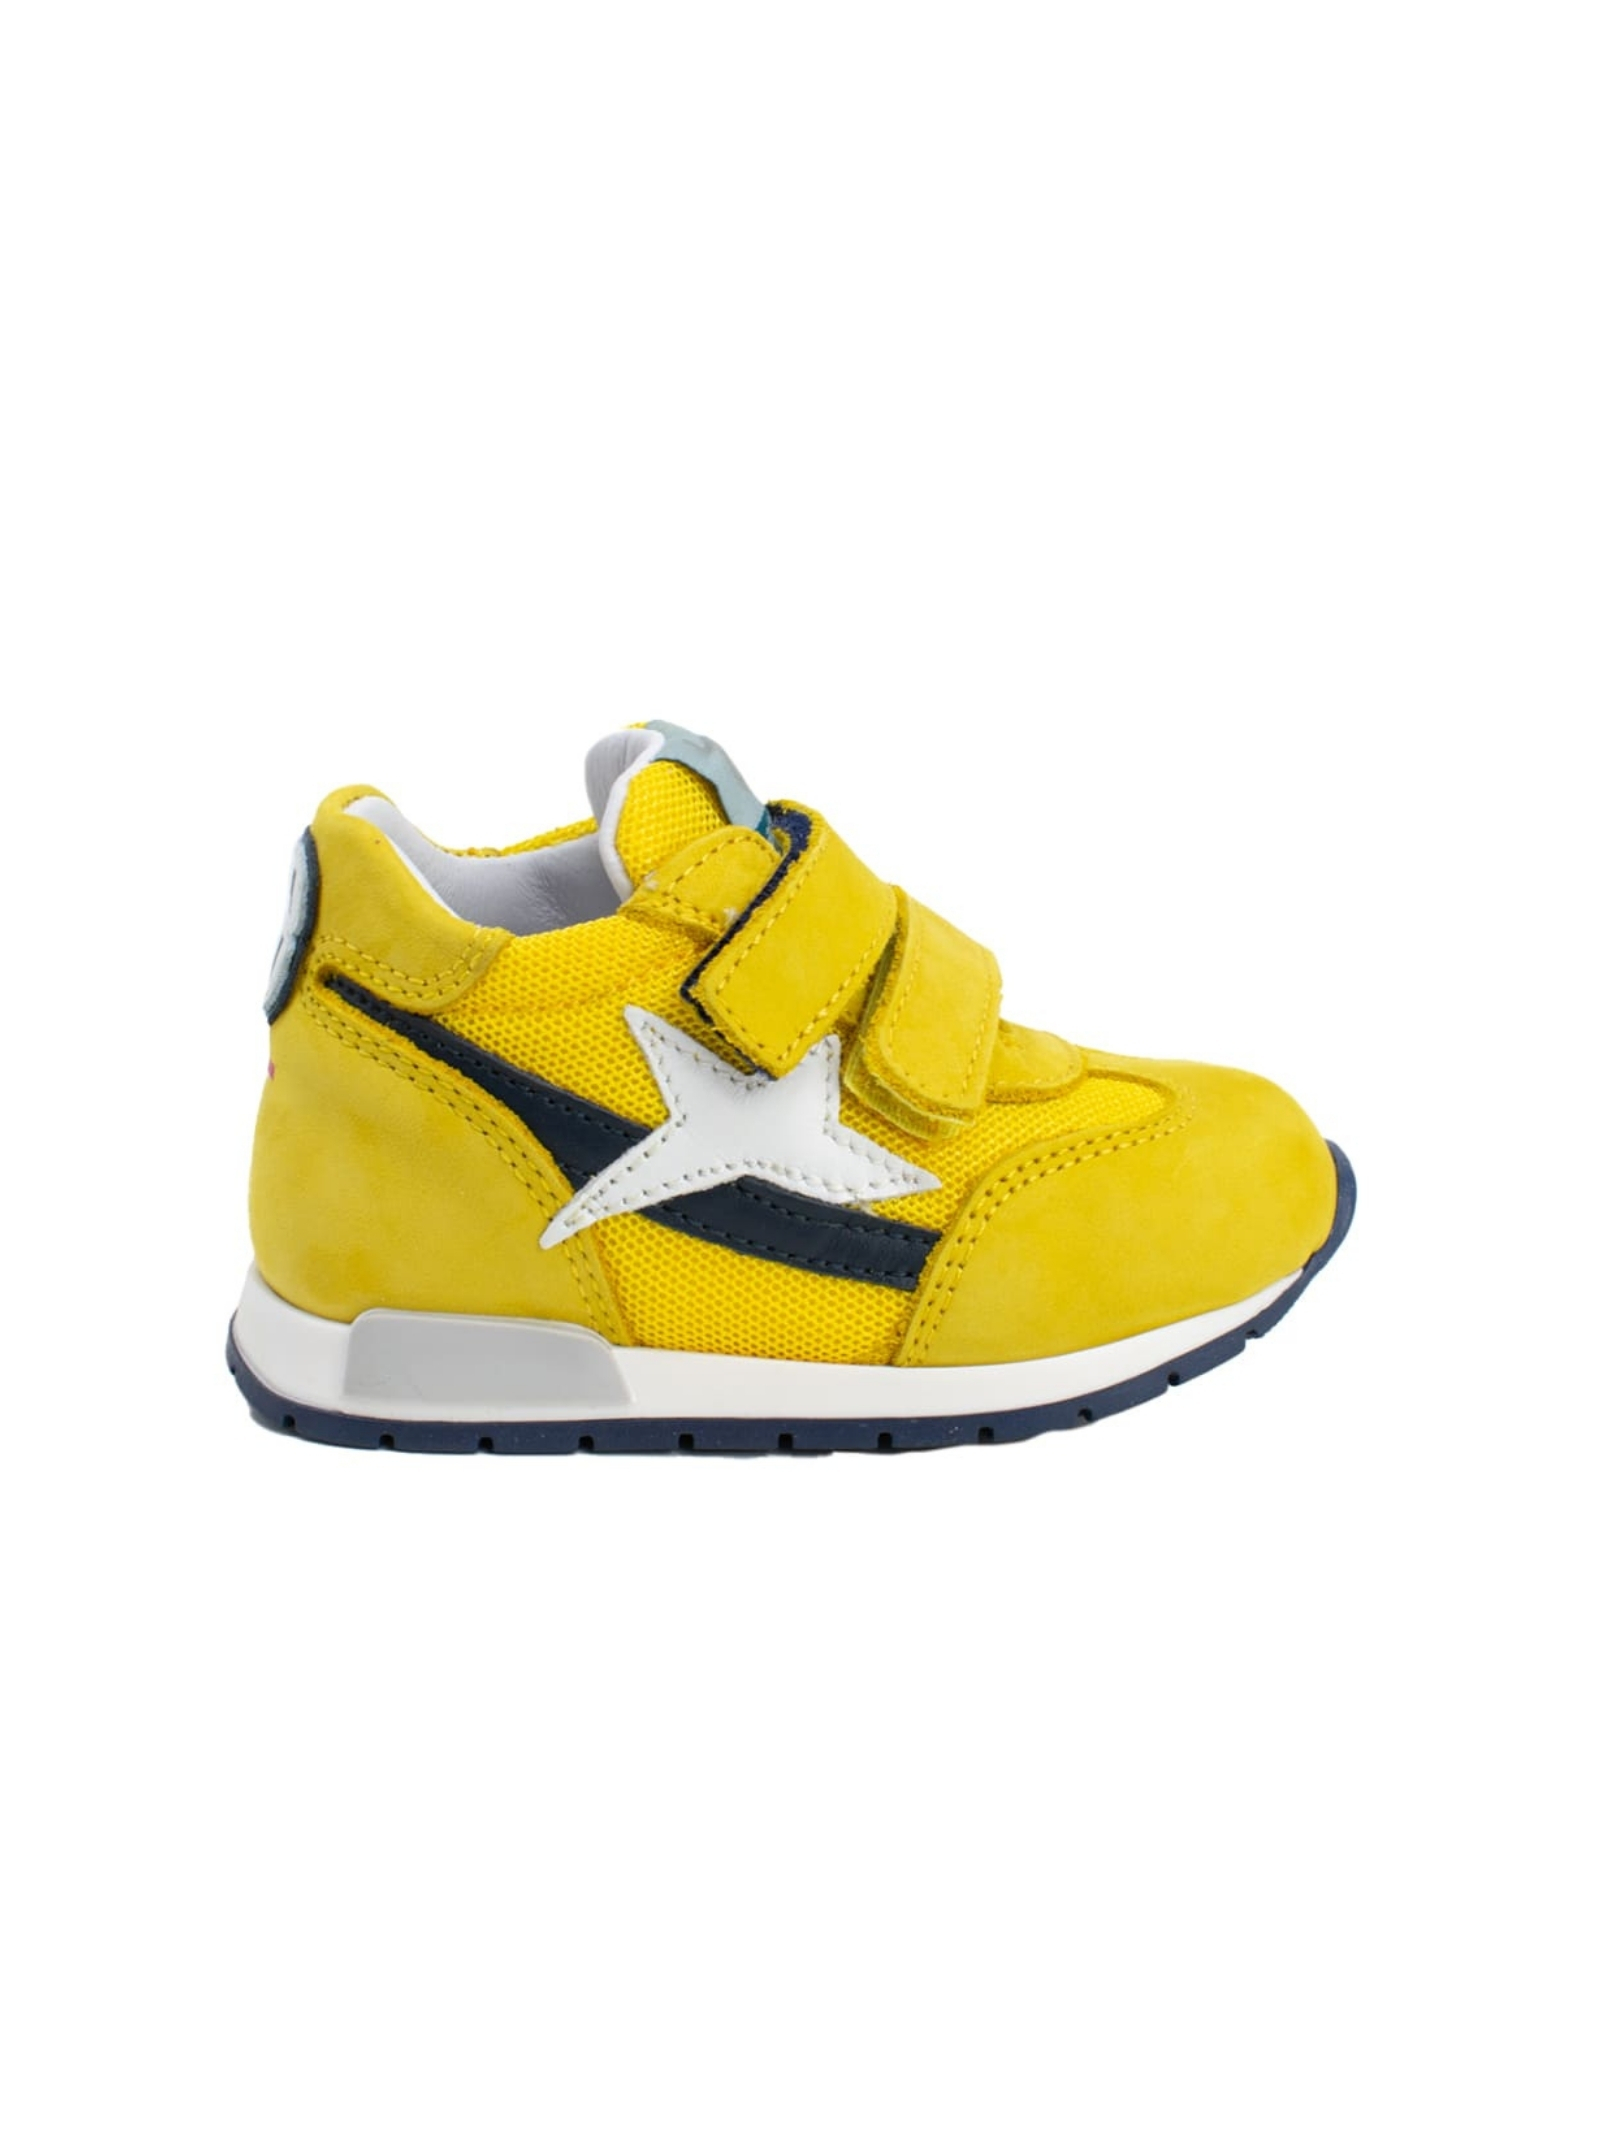 Sneakers Sport BALDUCCI | Sneakers | CSPO4552B13155